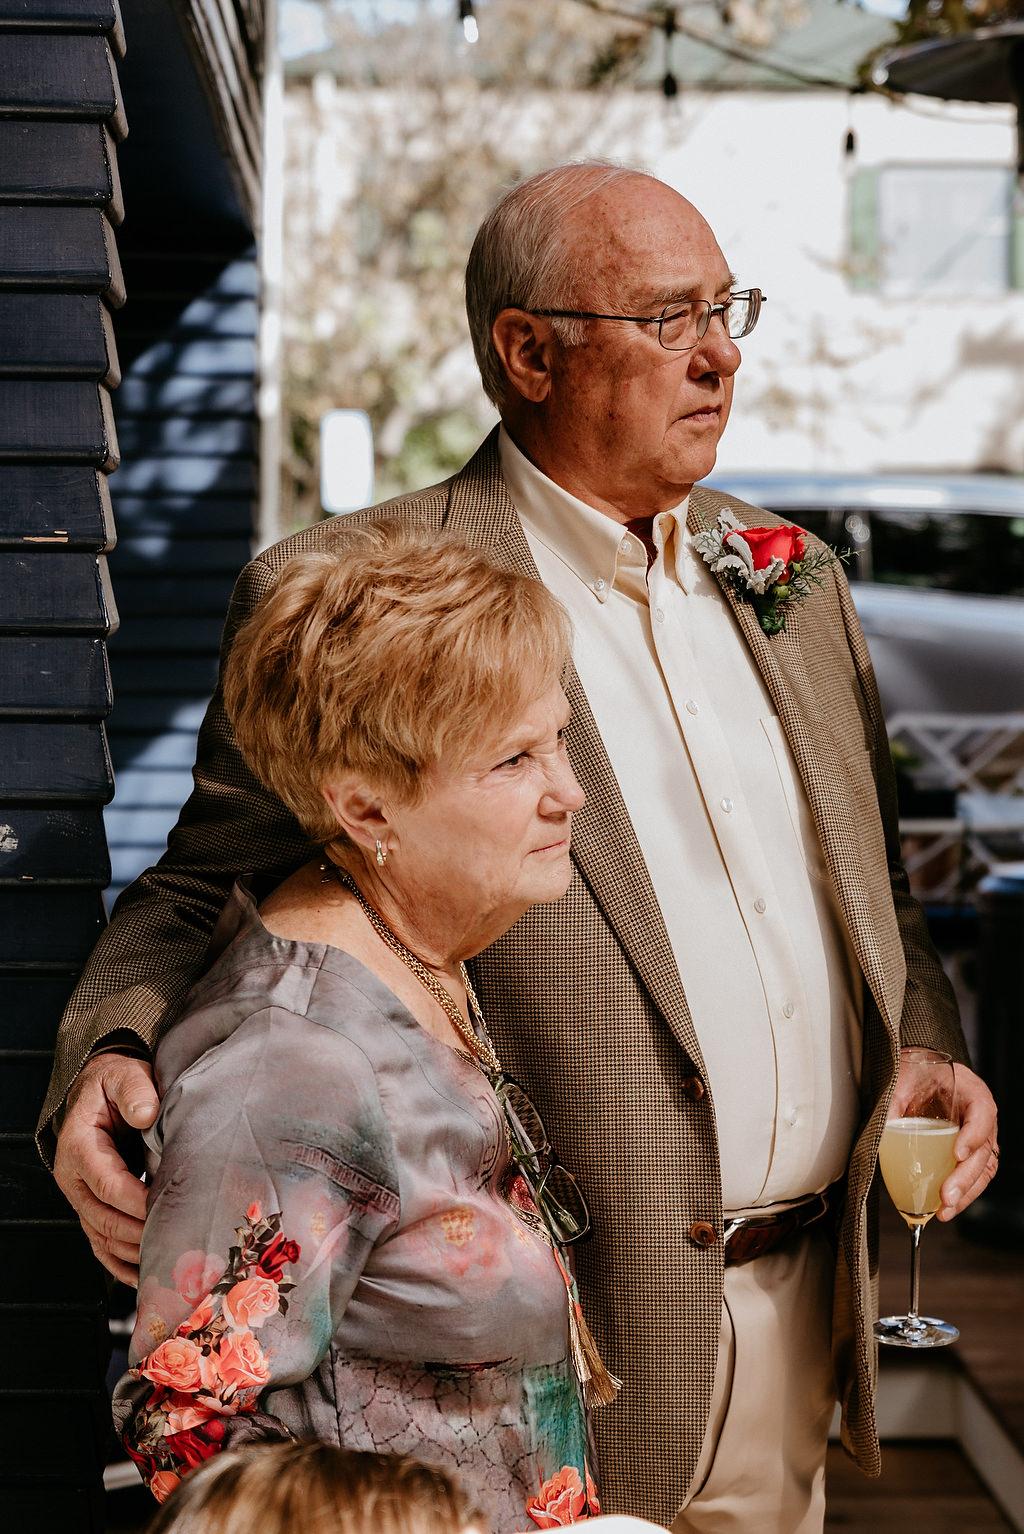 2018-HINGST-WEDDING-057-ANINDOORLADY